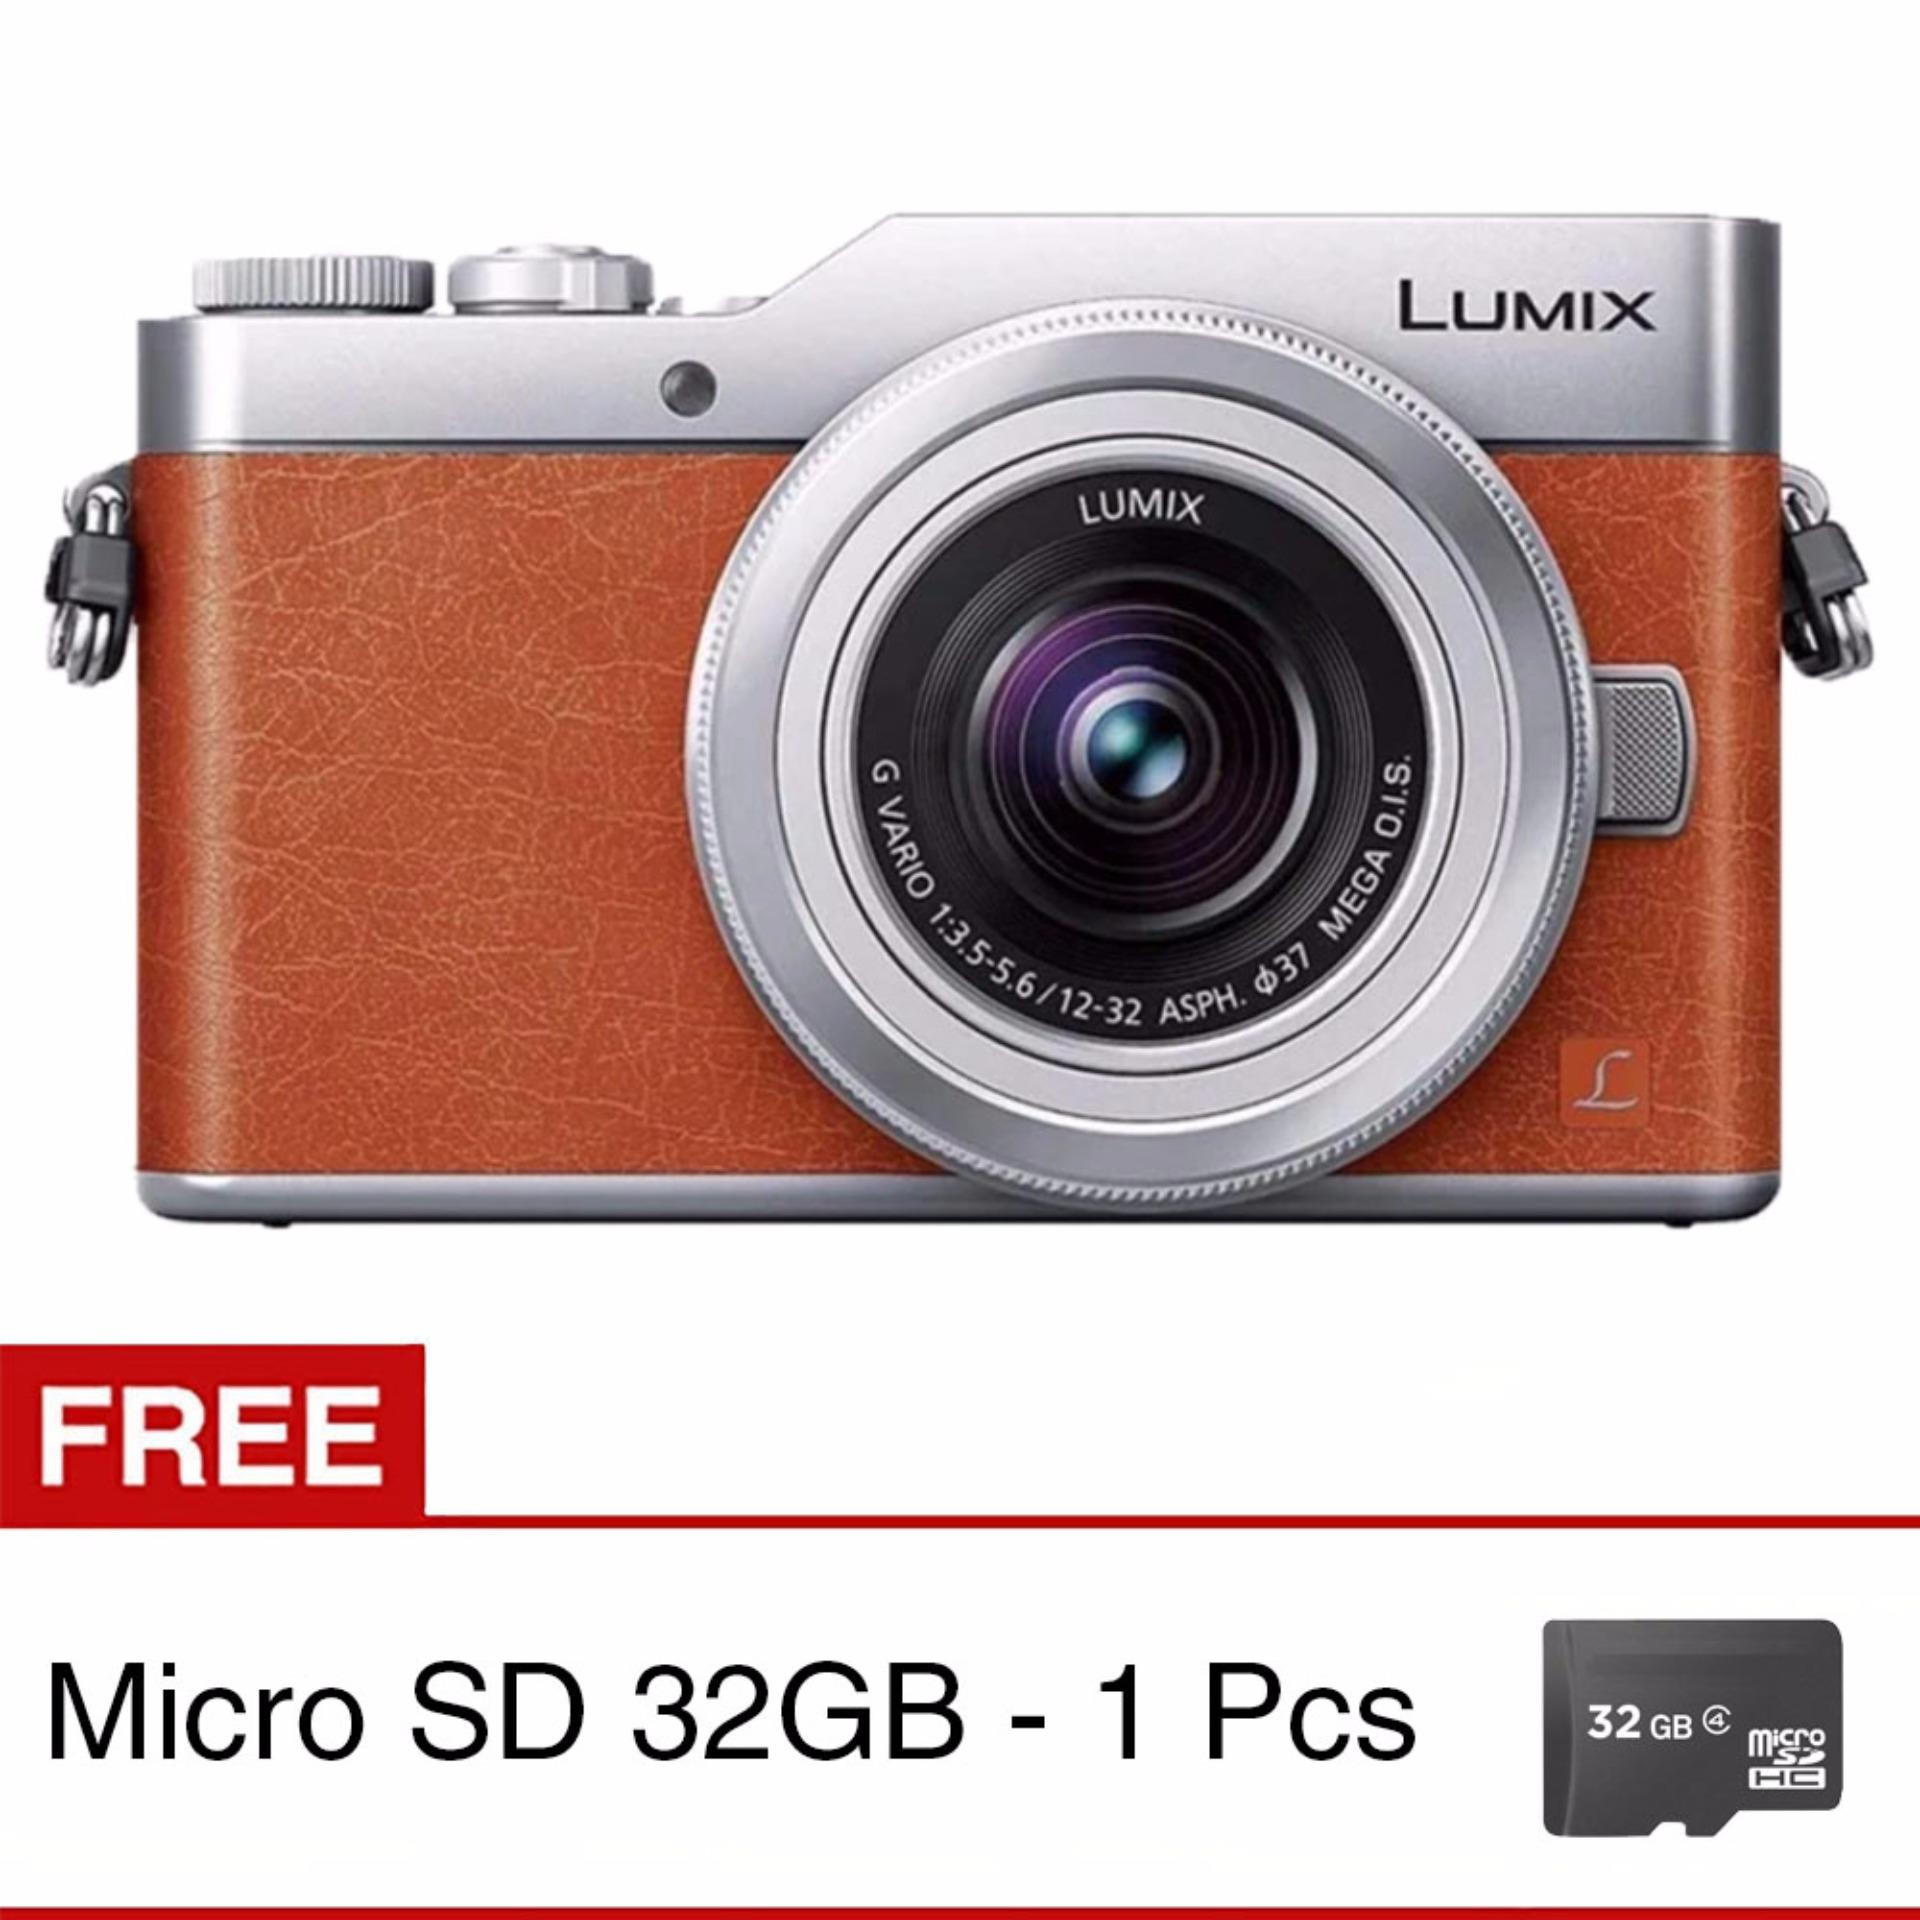 Hemat Kamera Panasonic Lumix Dmc Fz2500 Camera Prosumer Fz 2500 Fujifilm X Pro2 Gs Kit Xf23mm F20r Wr Xf 35mm F14 Gf9 12 32mm Gratis Micro Sd 32gb